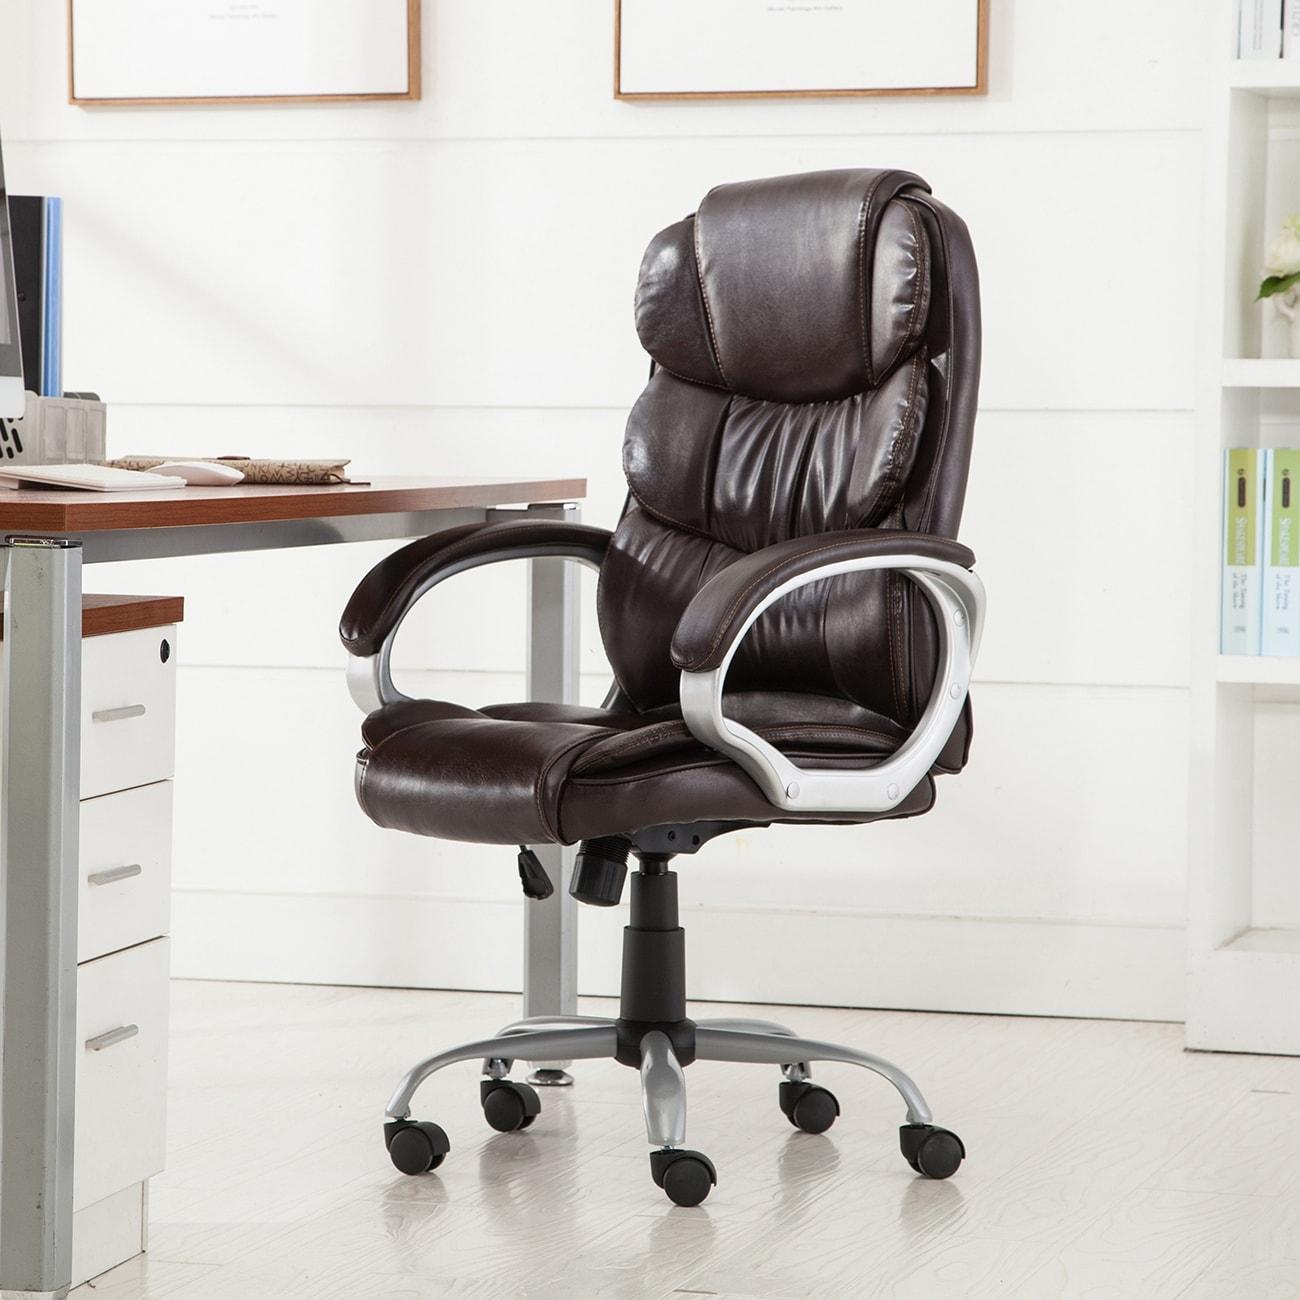 shop belleze executive office chair ergonomic padded armrest